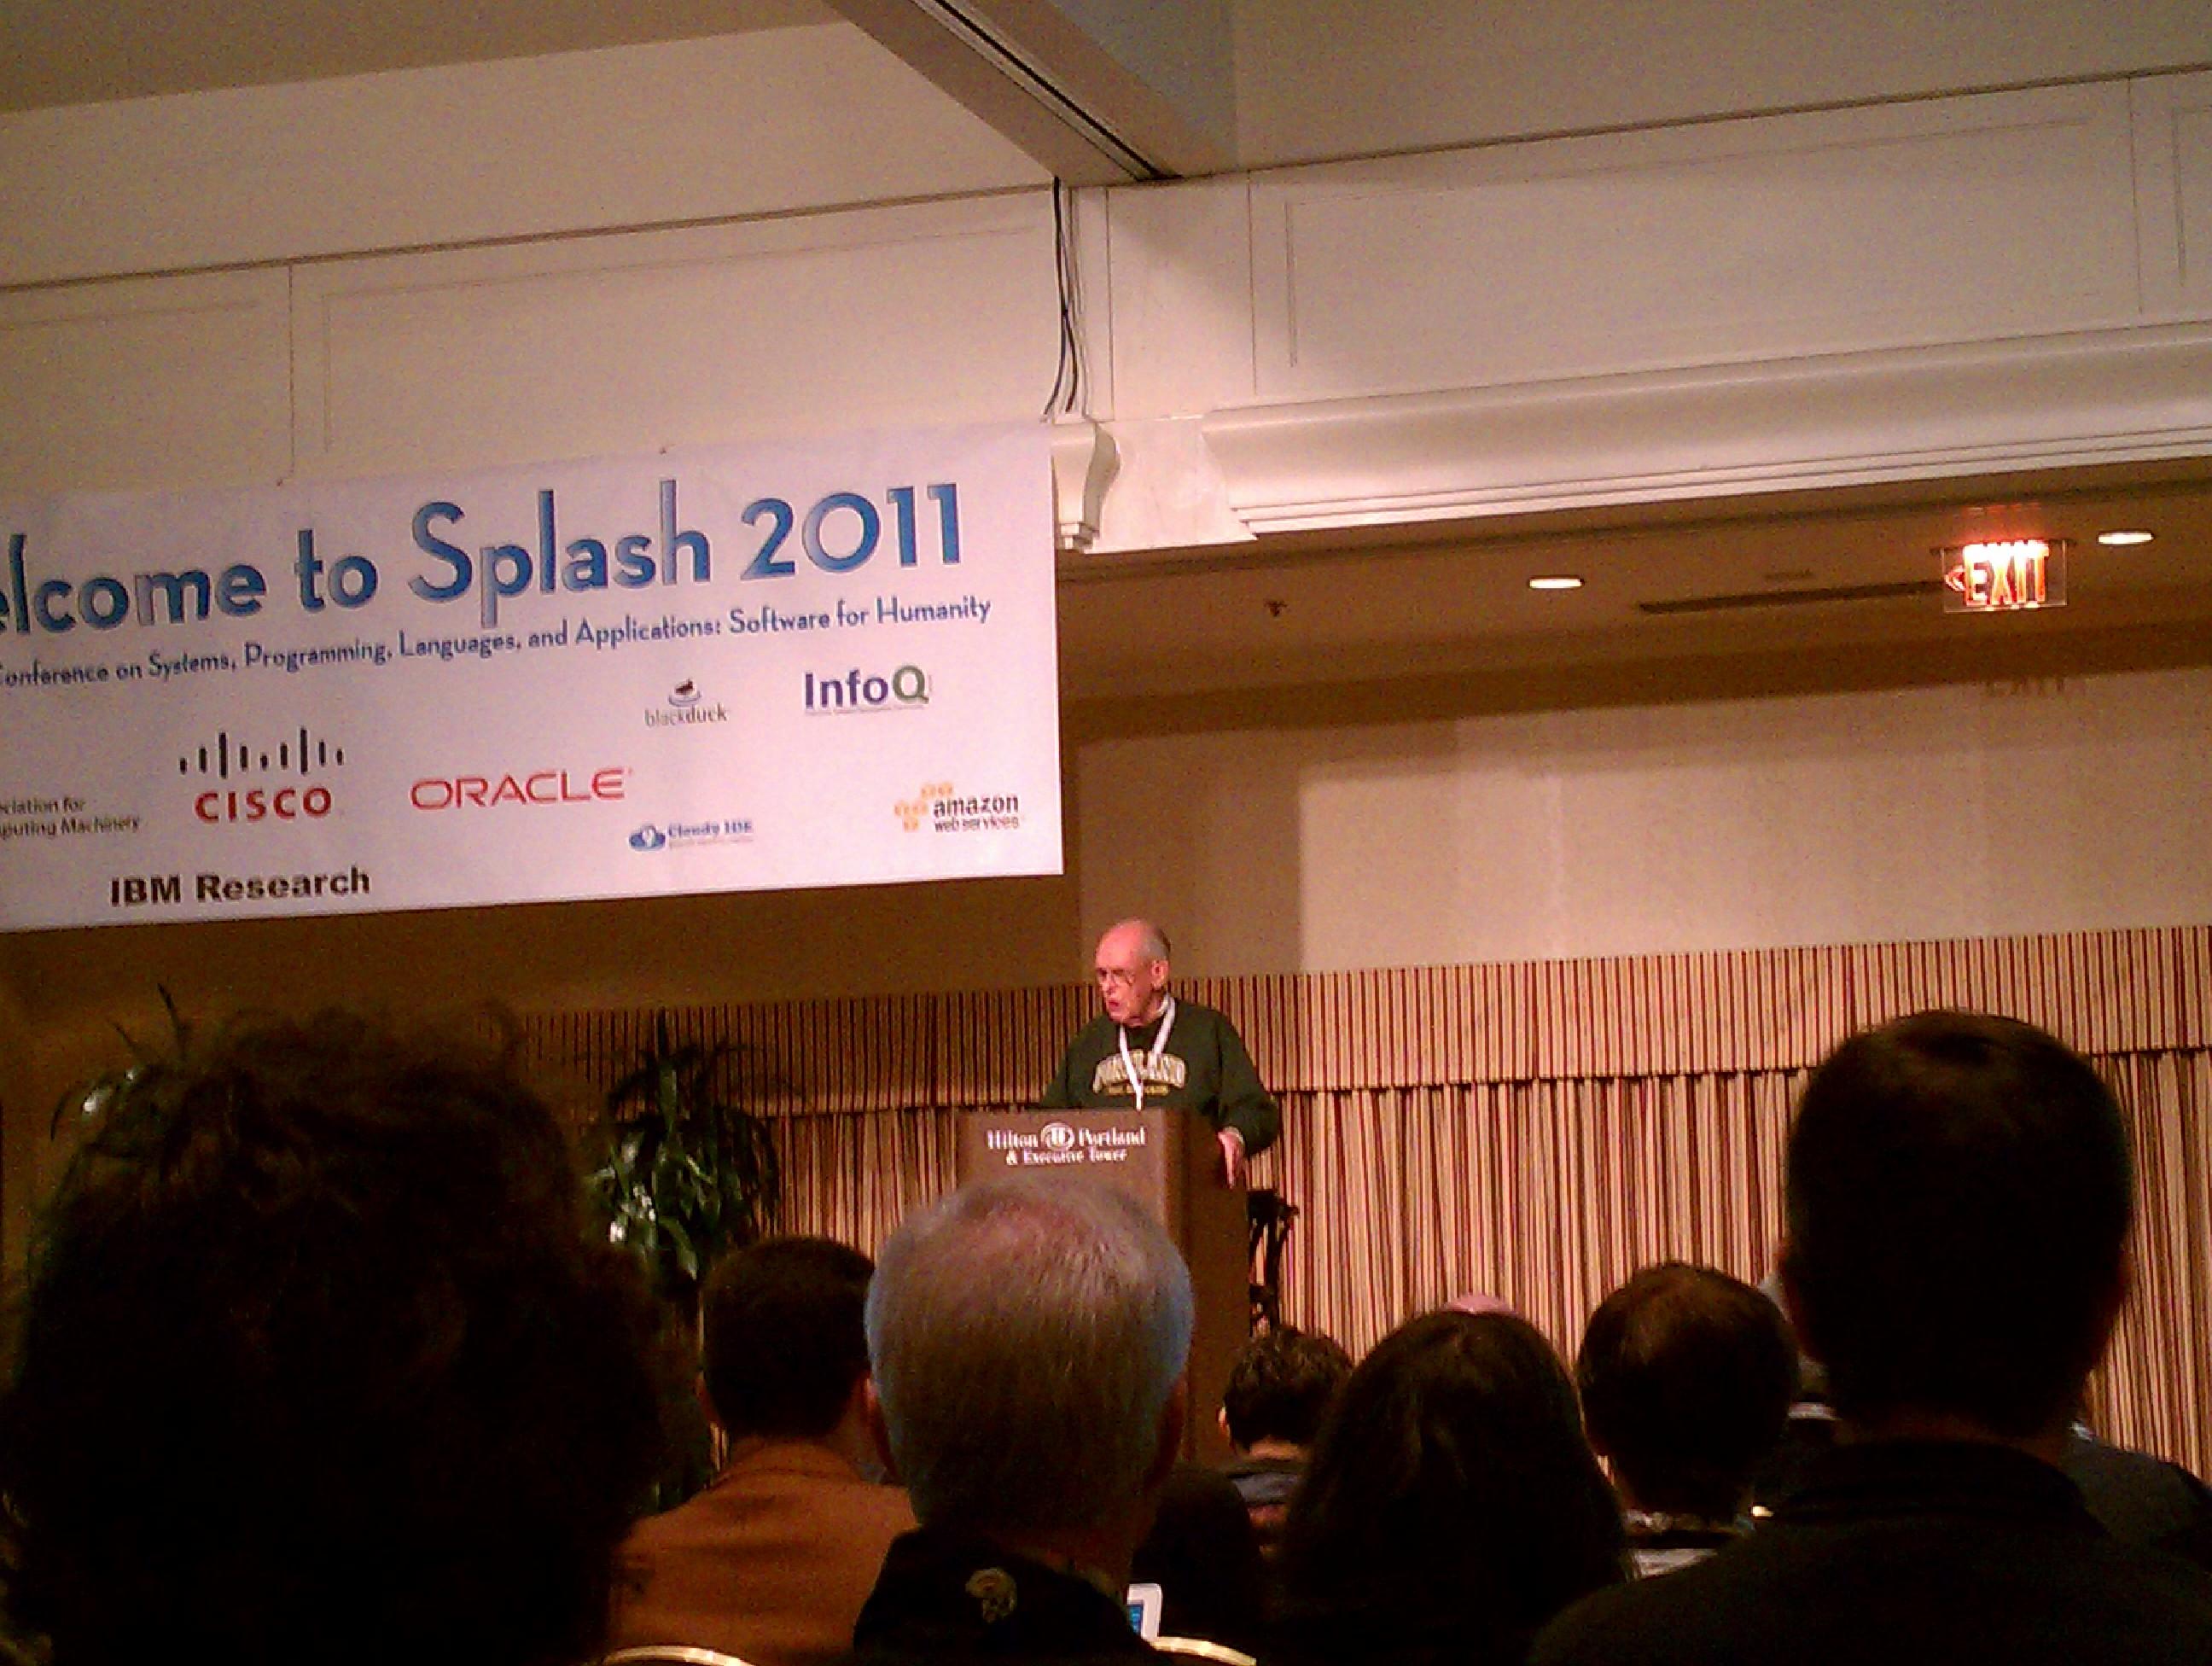 Turing Award-winner Ivan Sutherland speaking.